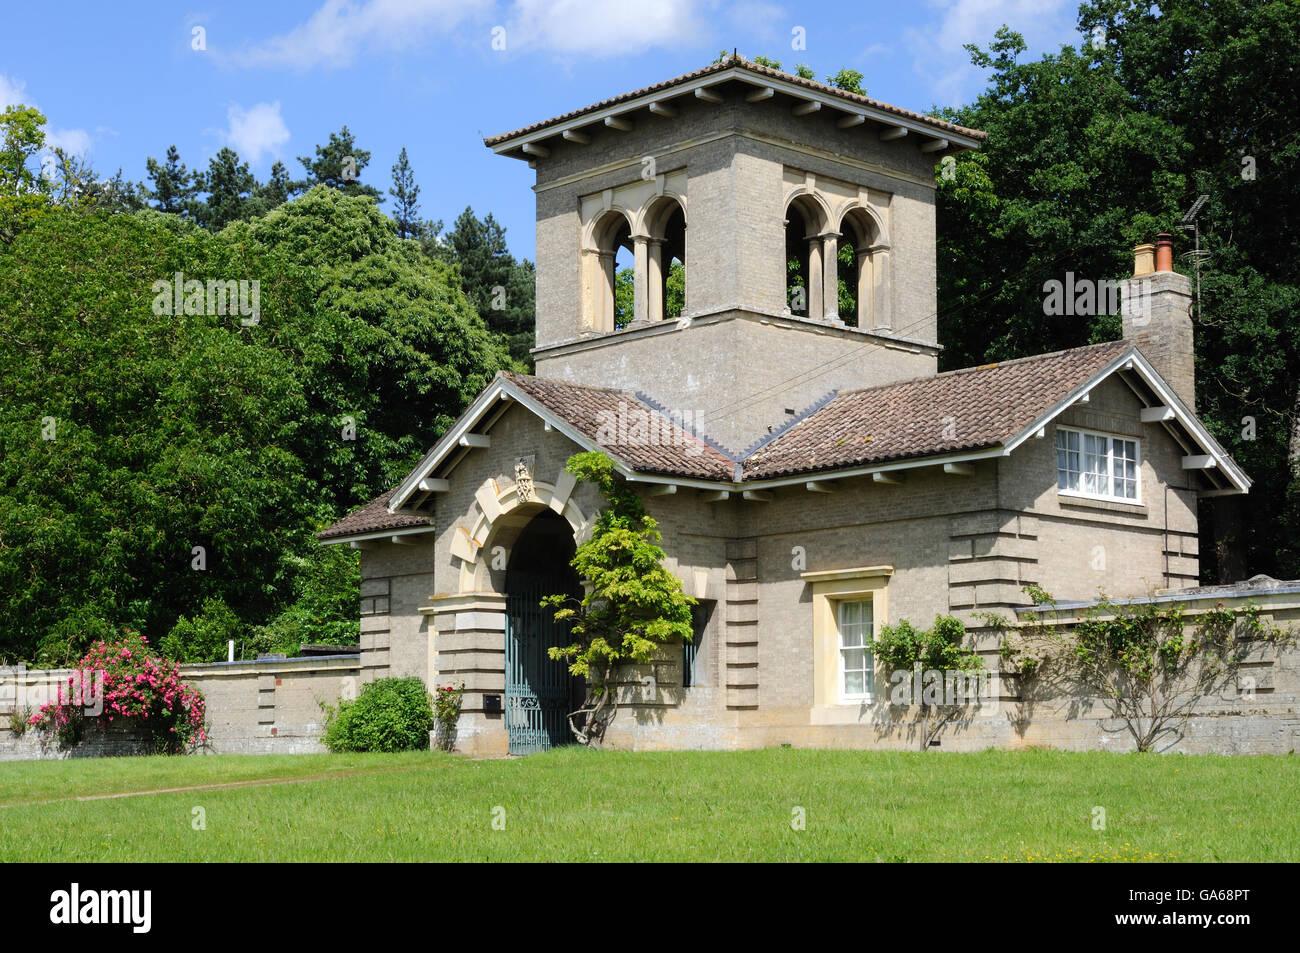 Italianate-style Needham Lodge (attributed to Sir Charles Barry) for Shrubland Hall, near Coddenham, Suffolk, England - Stock Image